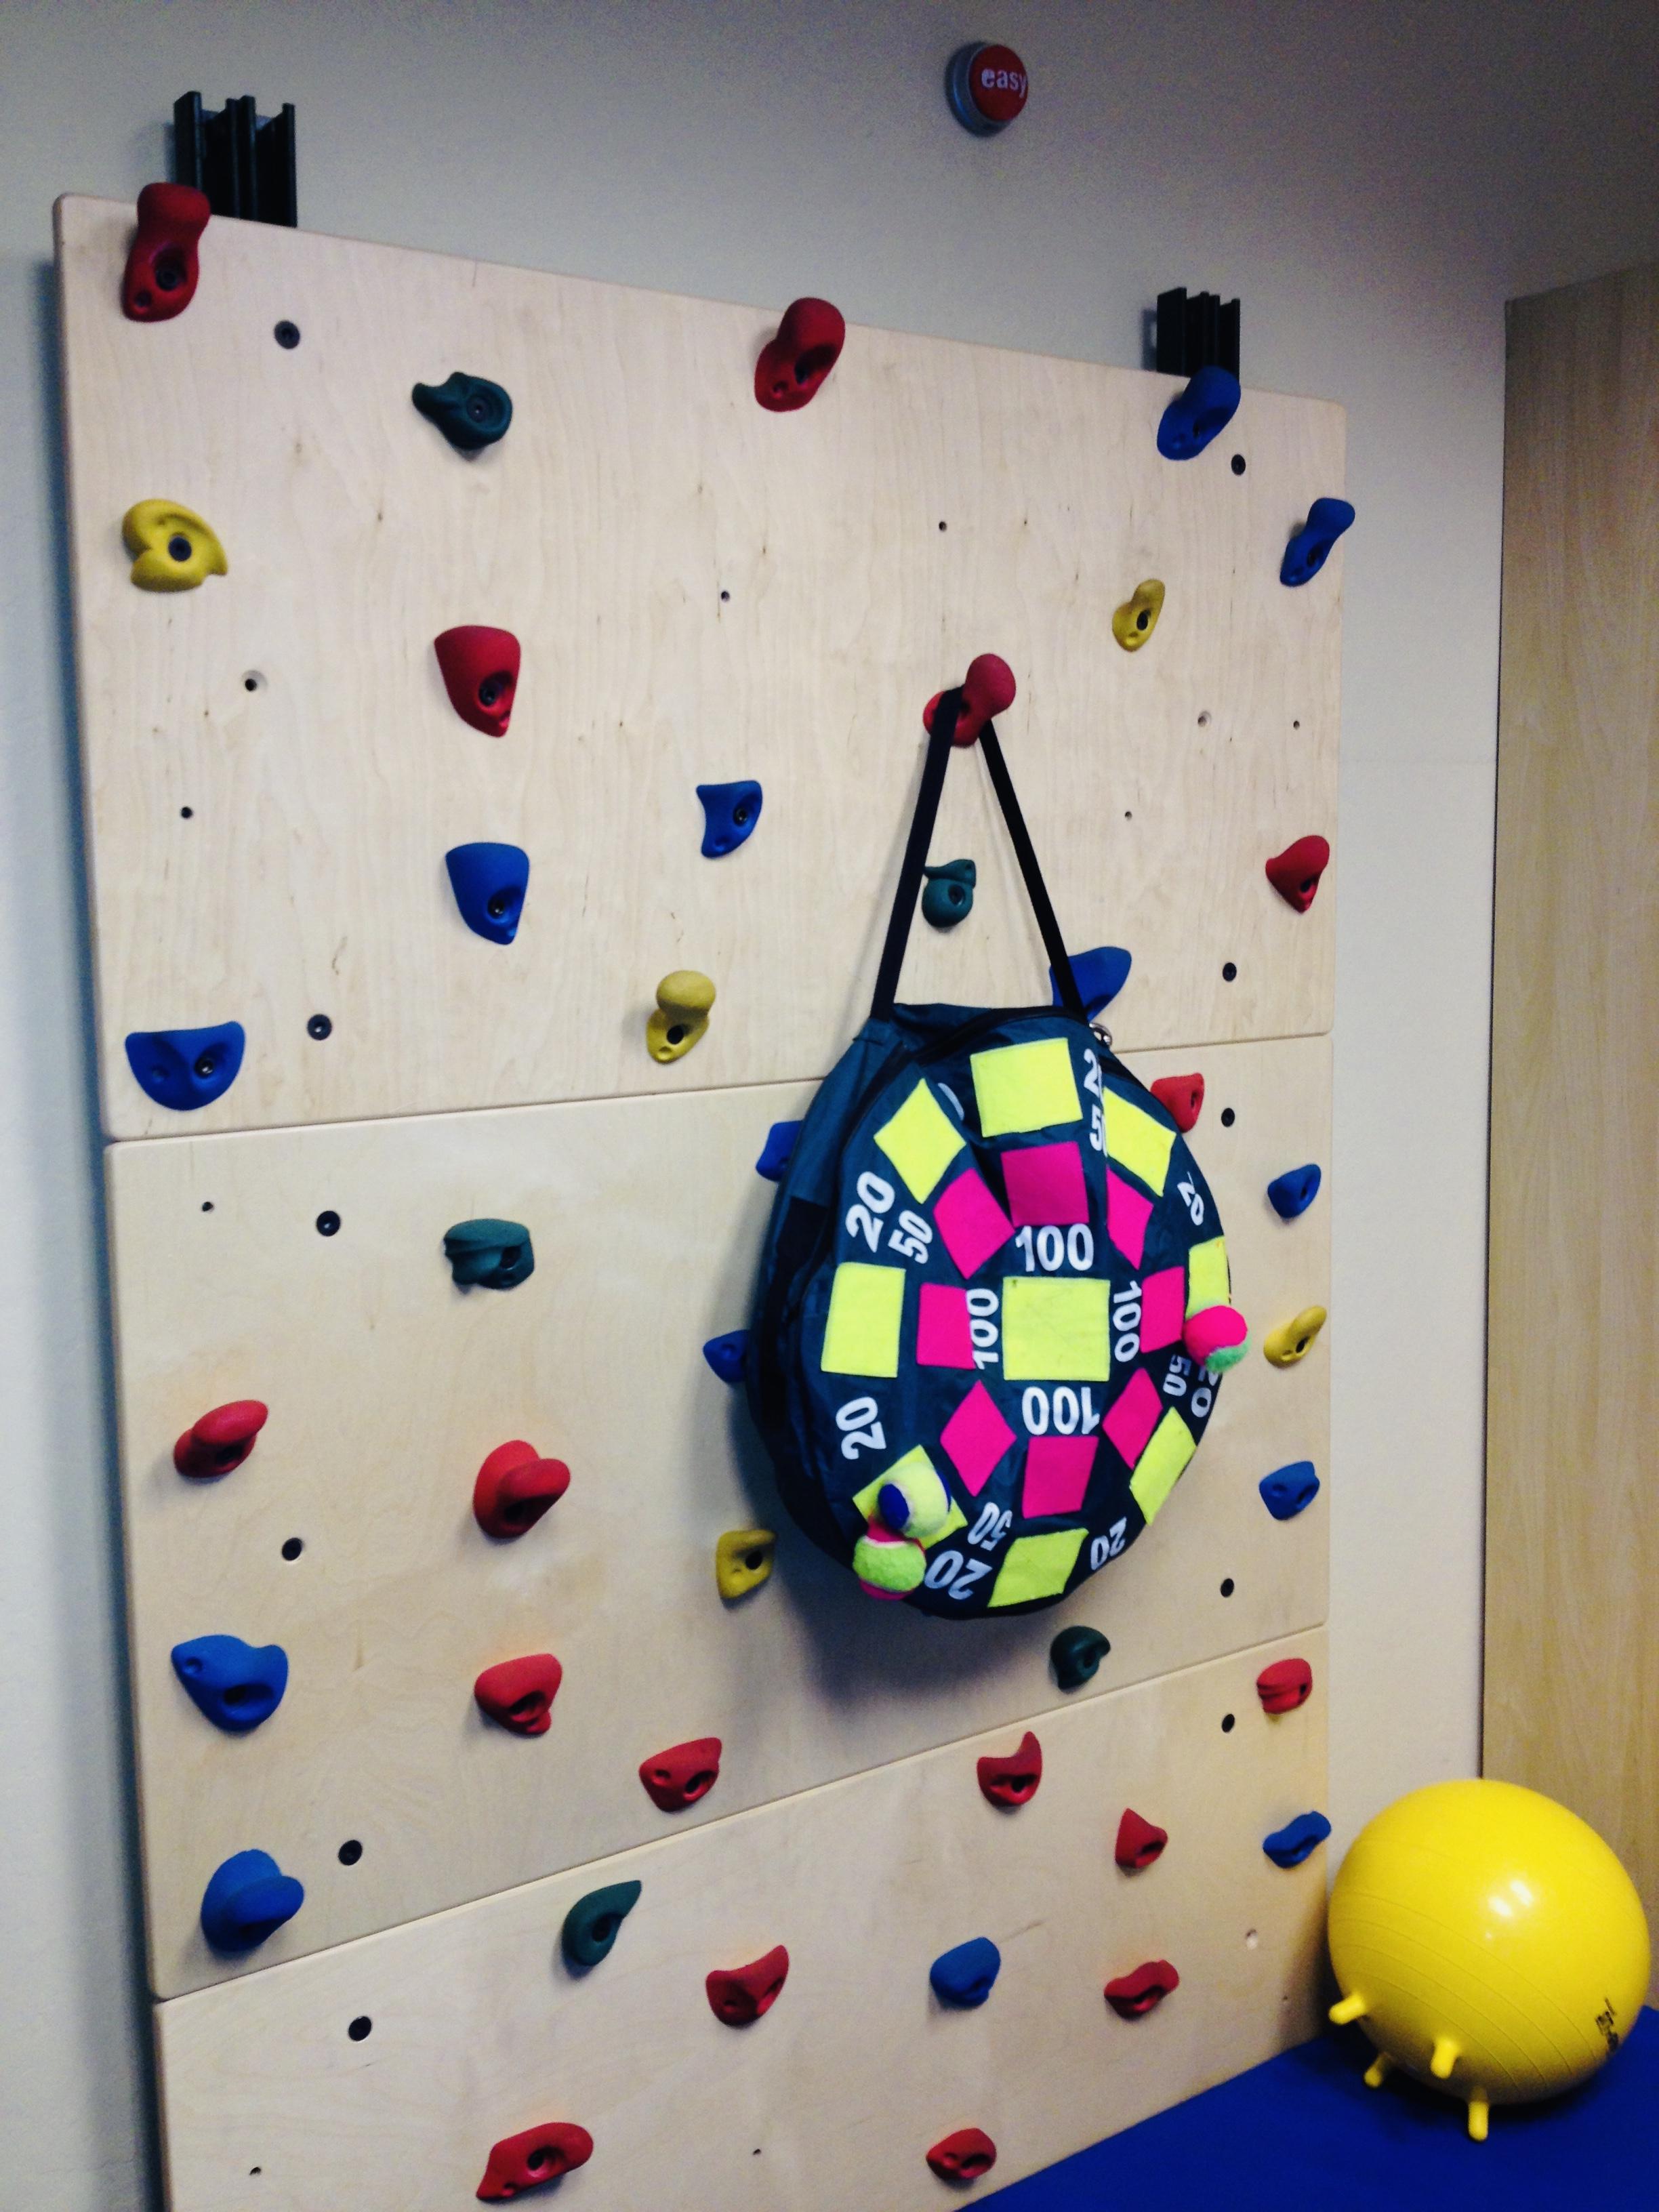 Velcro dart board hanging from rock climbing wall